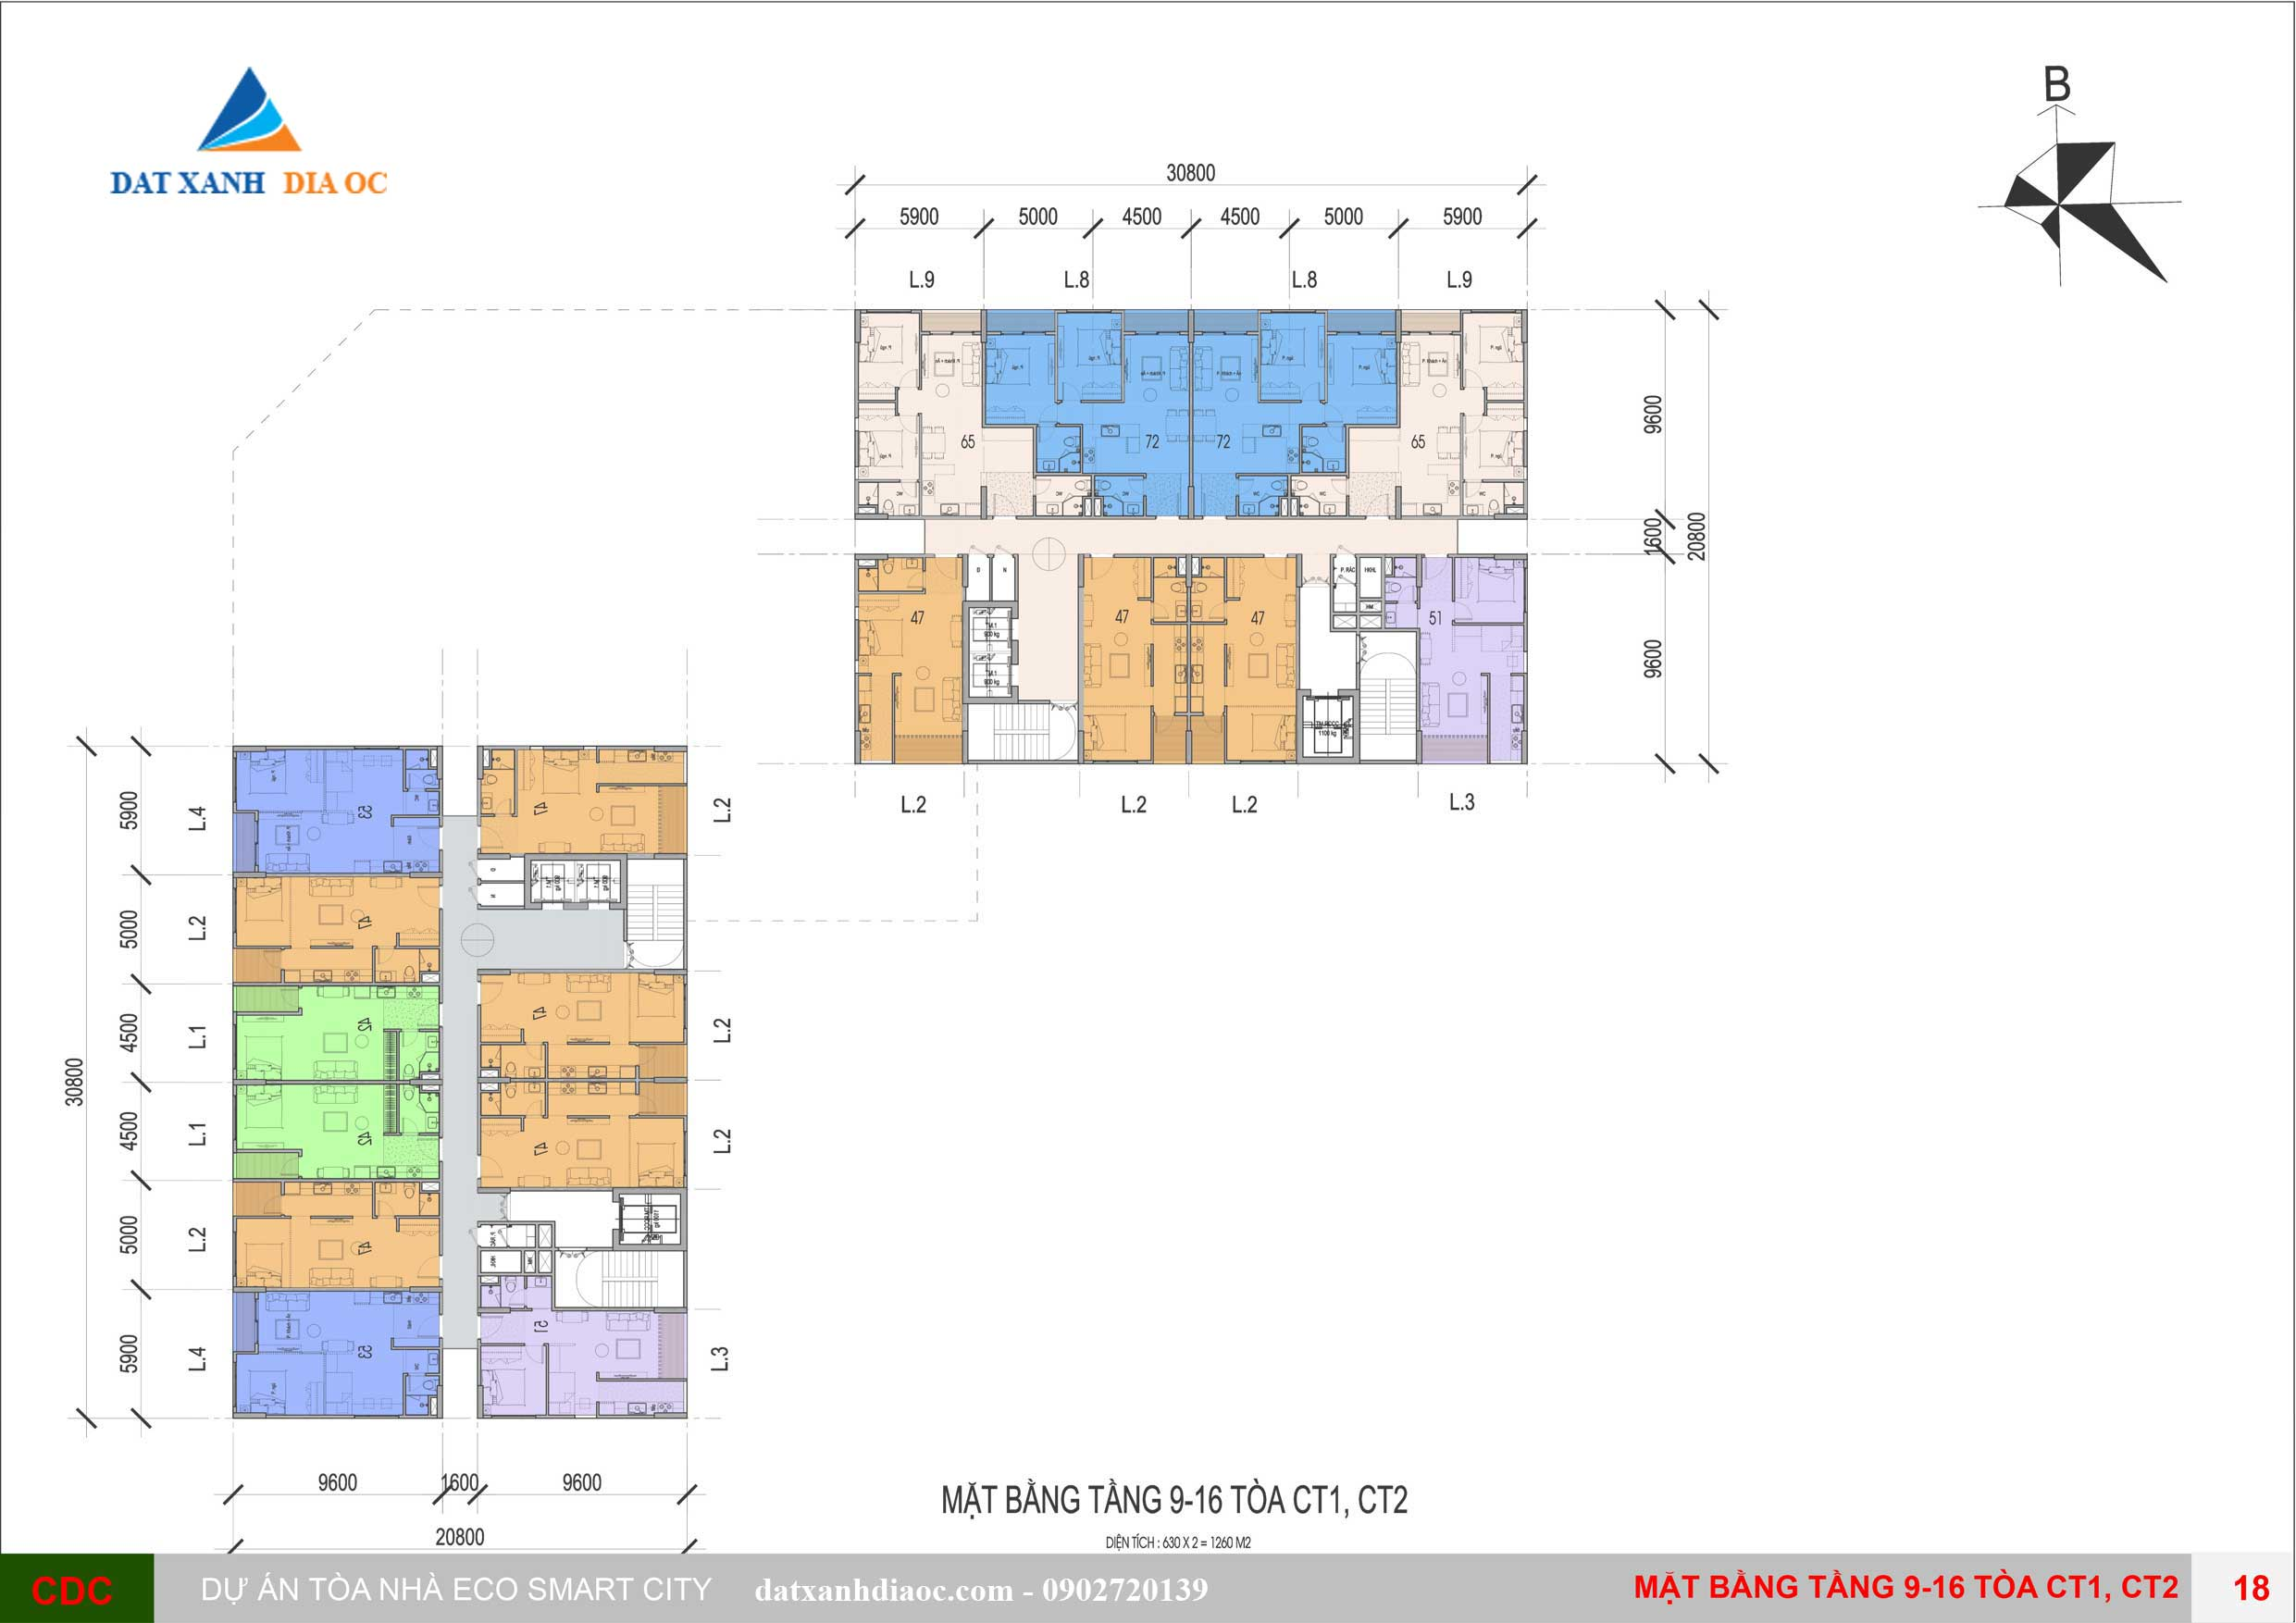 Mặt bằng tầng tòa CT1- CT2 tầng 9-16 Eco Smart City Cổ Linh